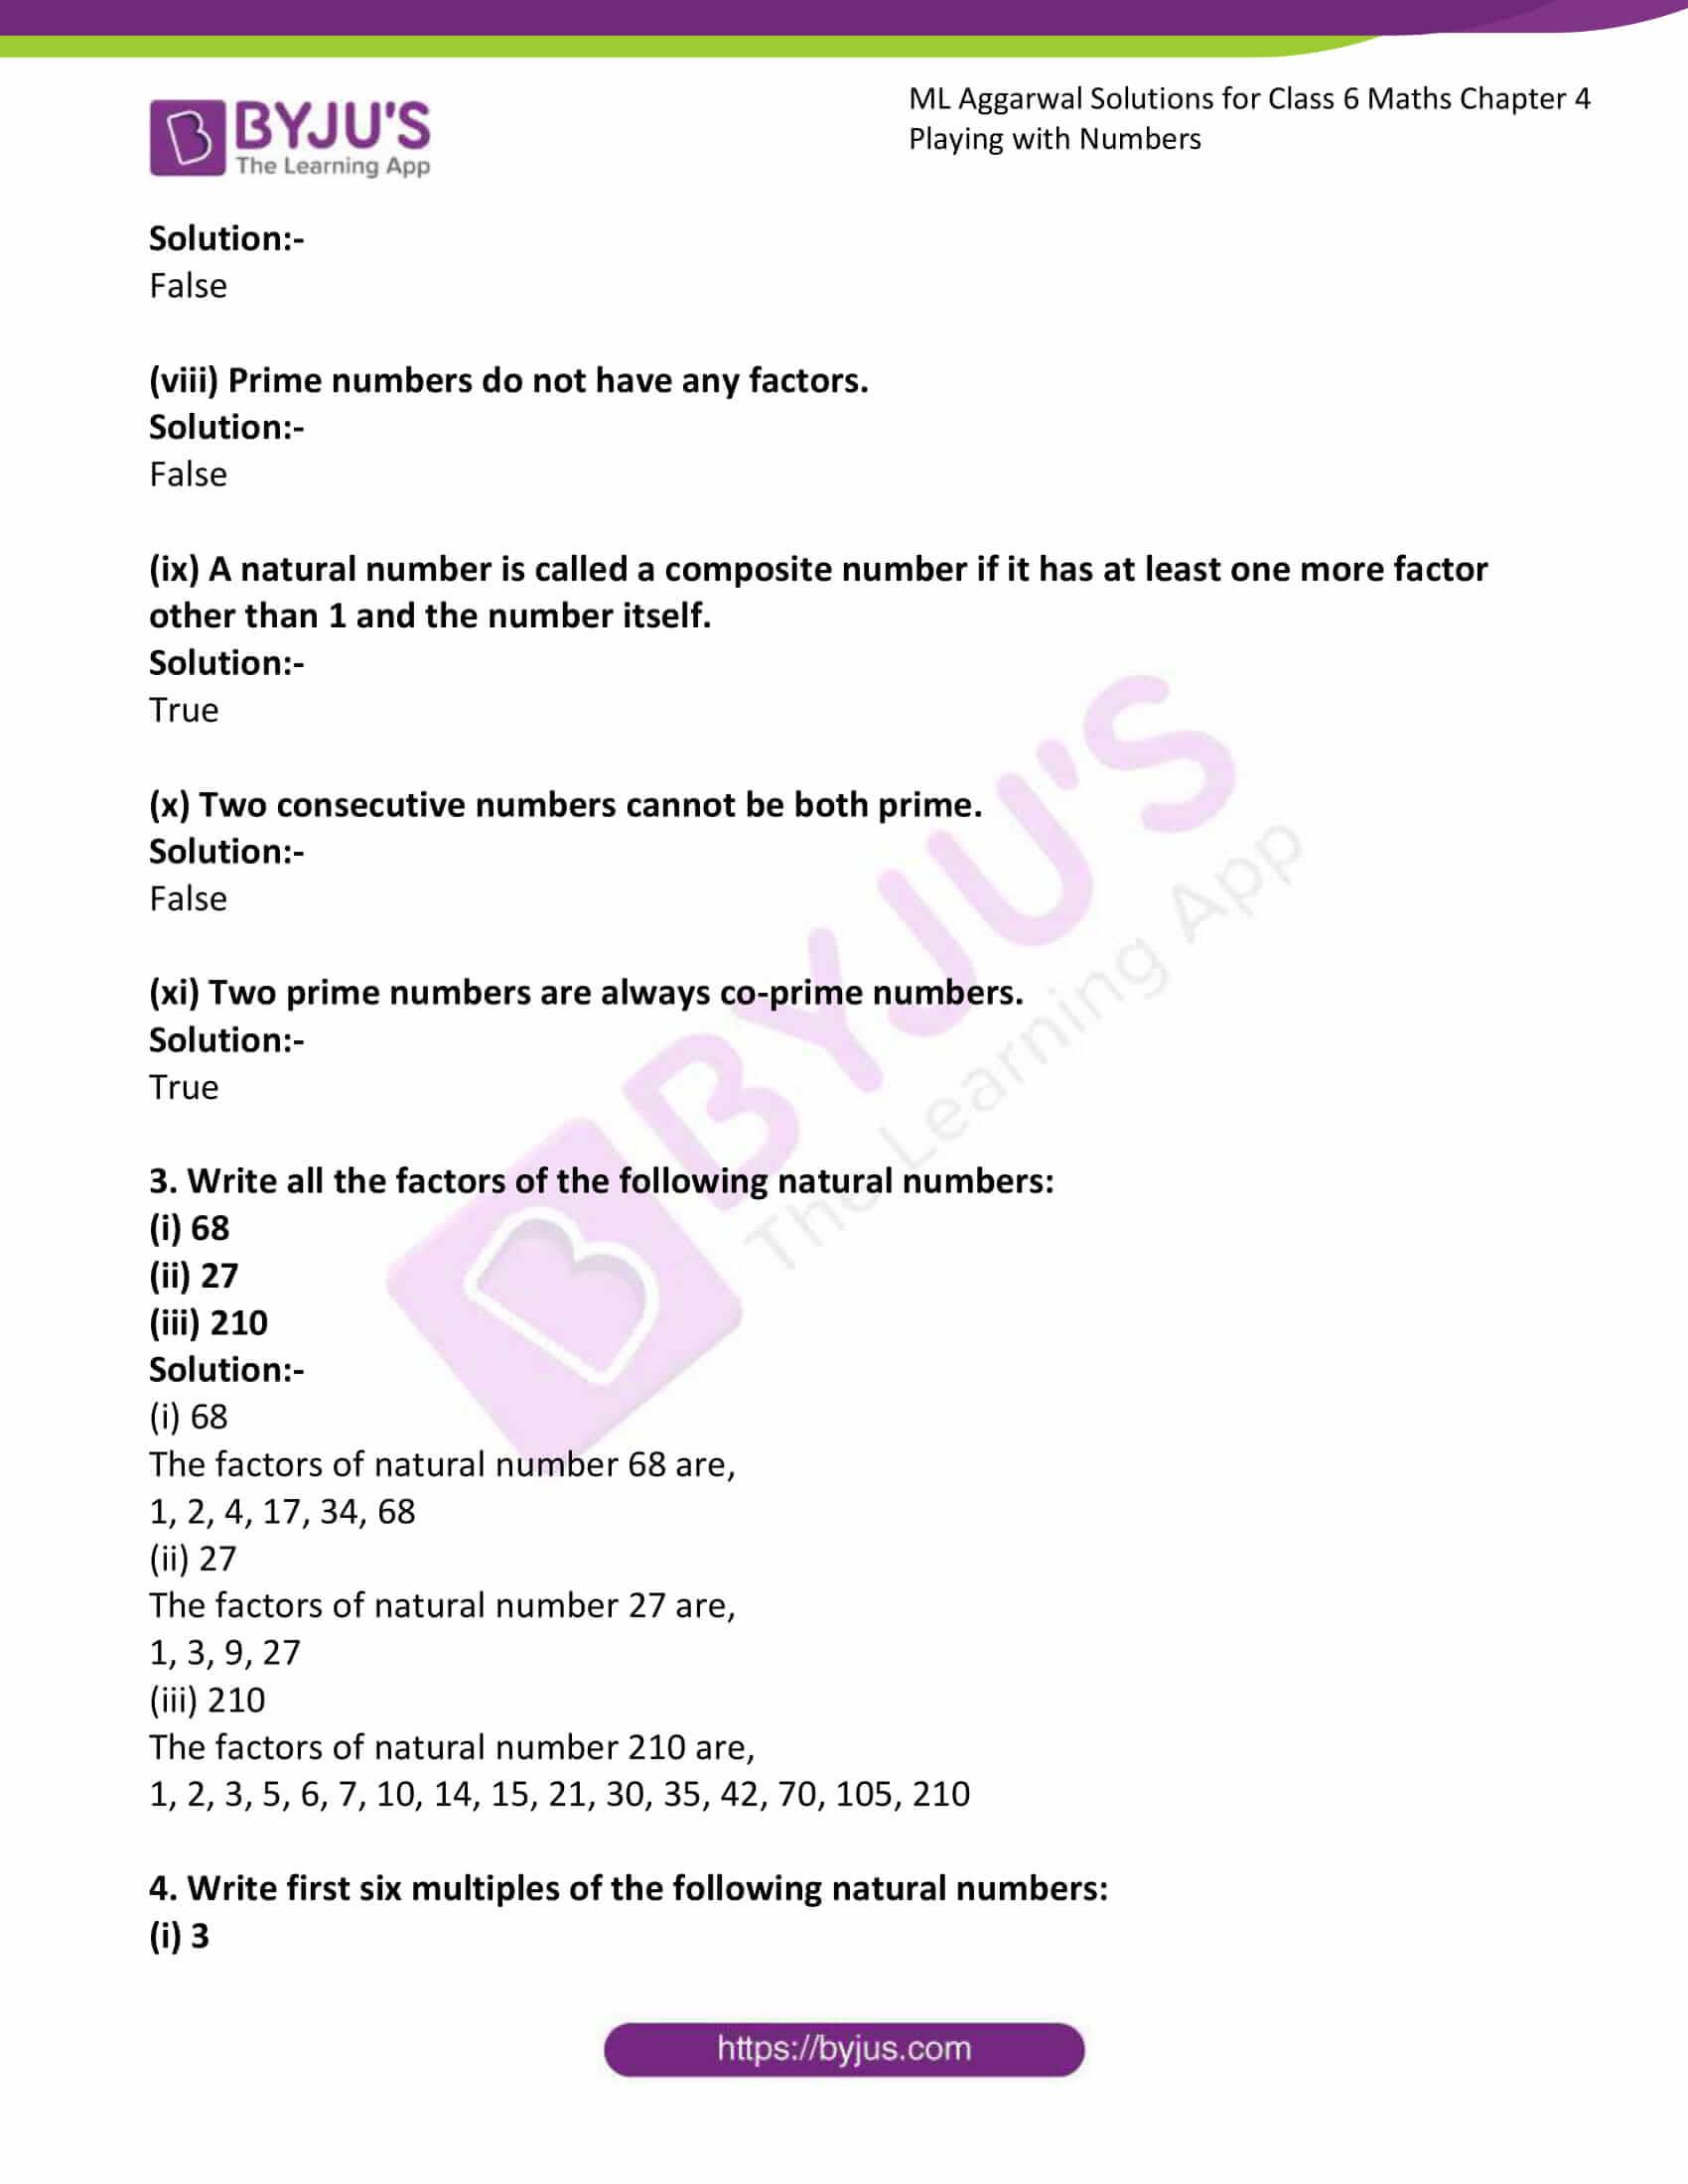 ml aggarwal sol class 6 maths chapter 4 3